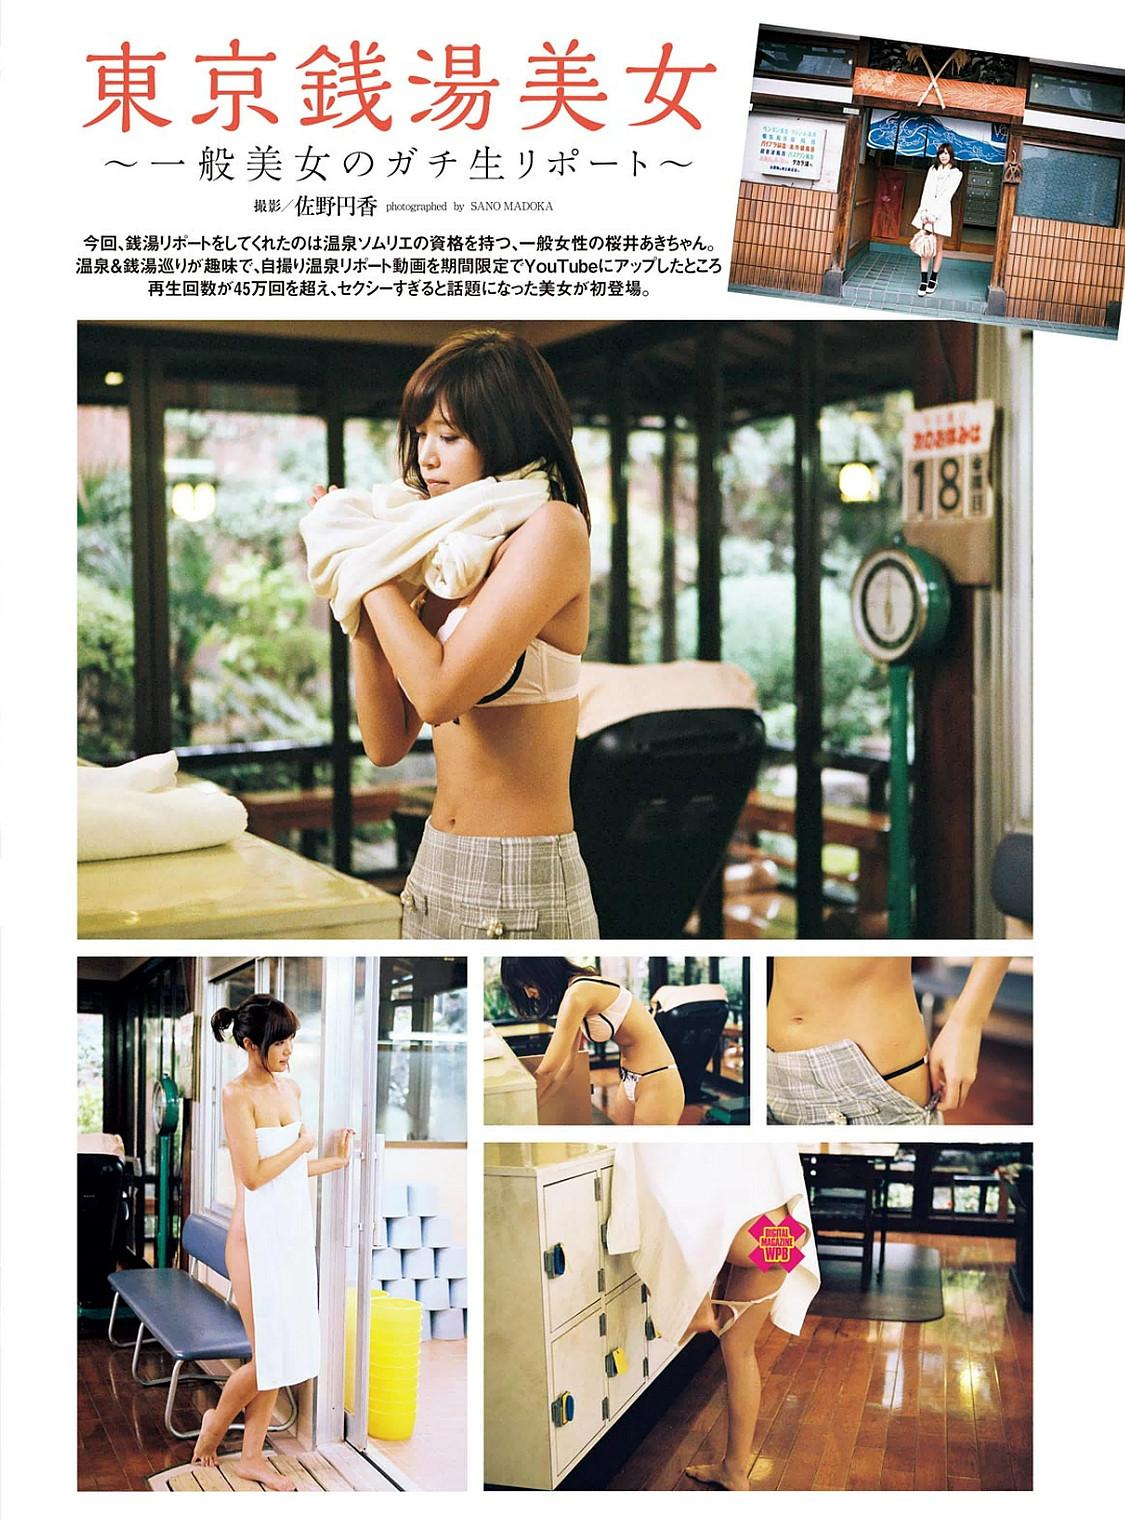 Weekly Playboy NEW YEAR 2017 15-001